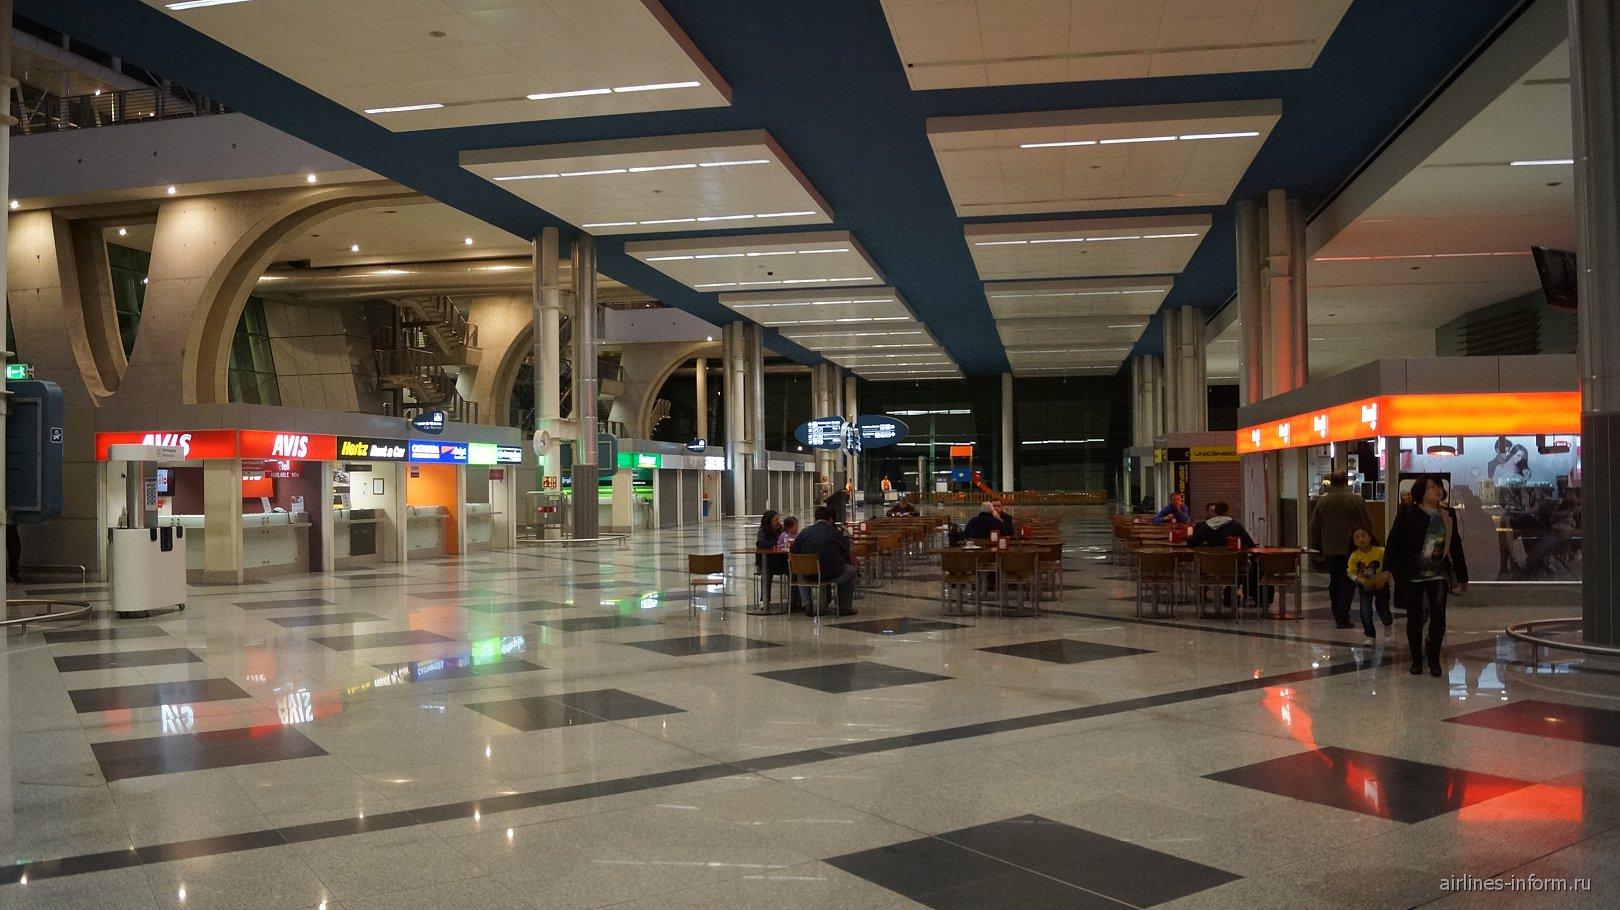 Зал прилета в аэропорту Порту Франциско Карнейро